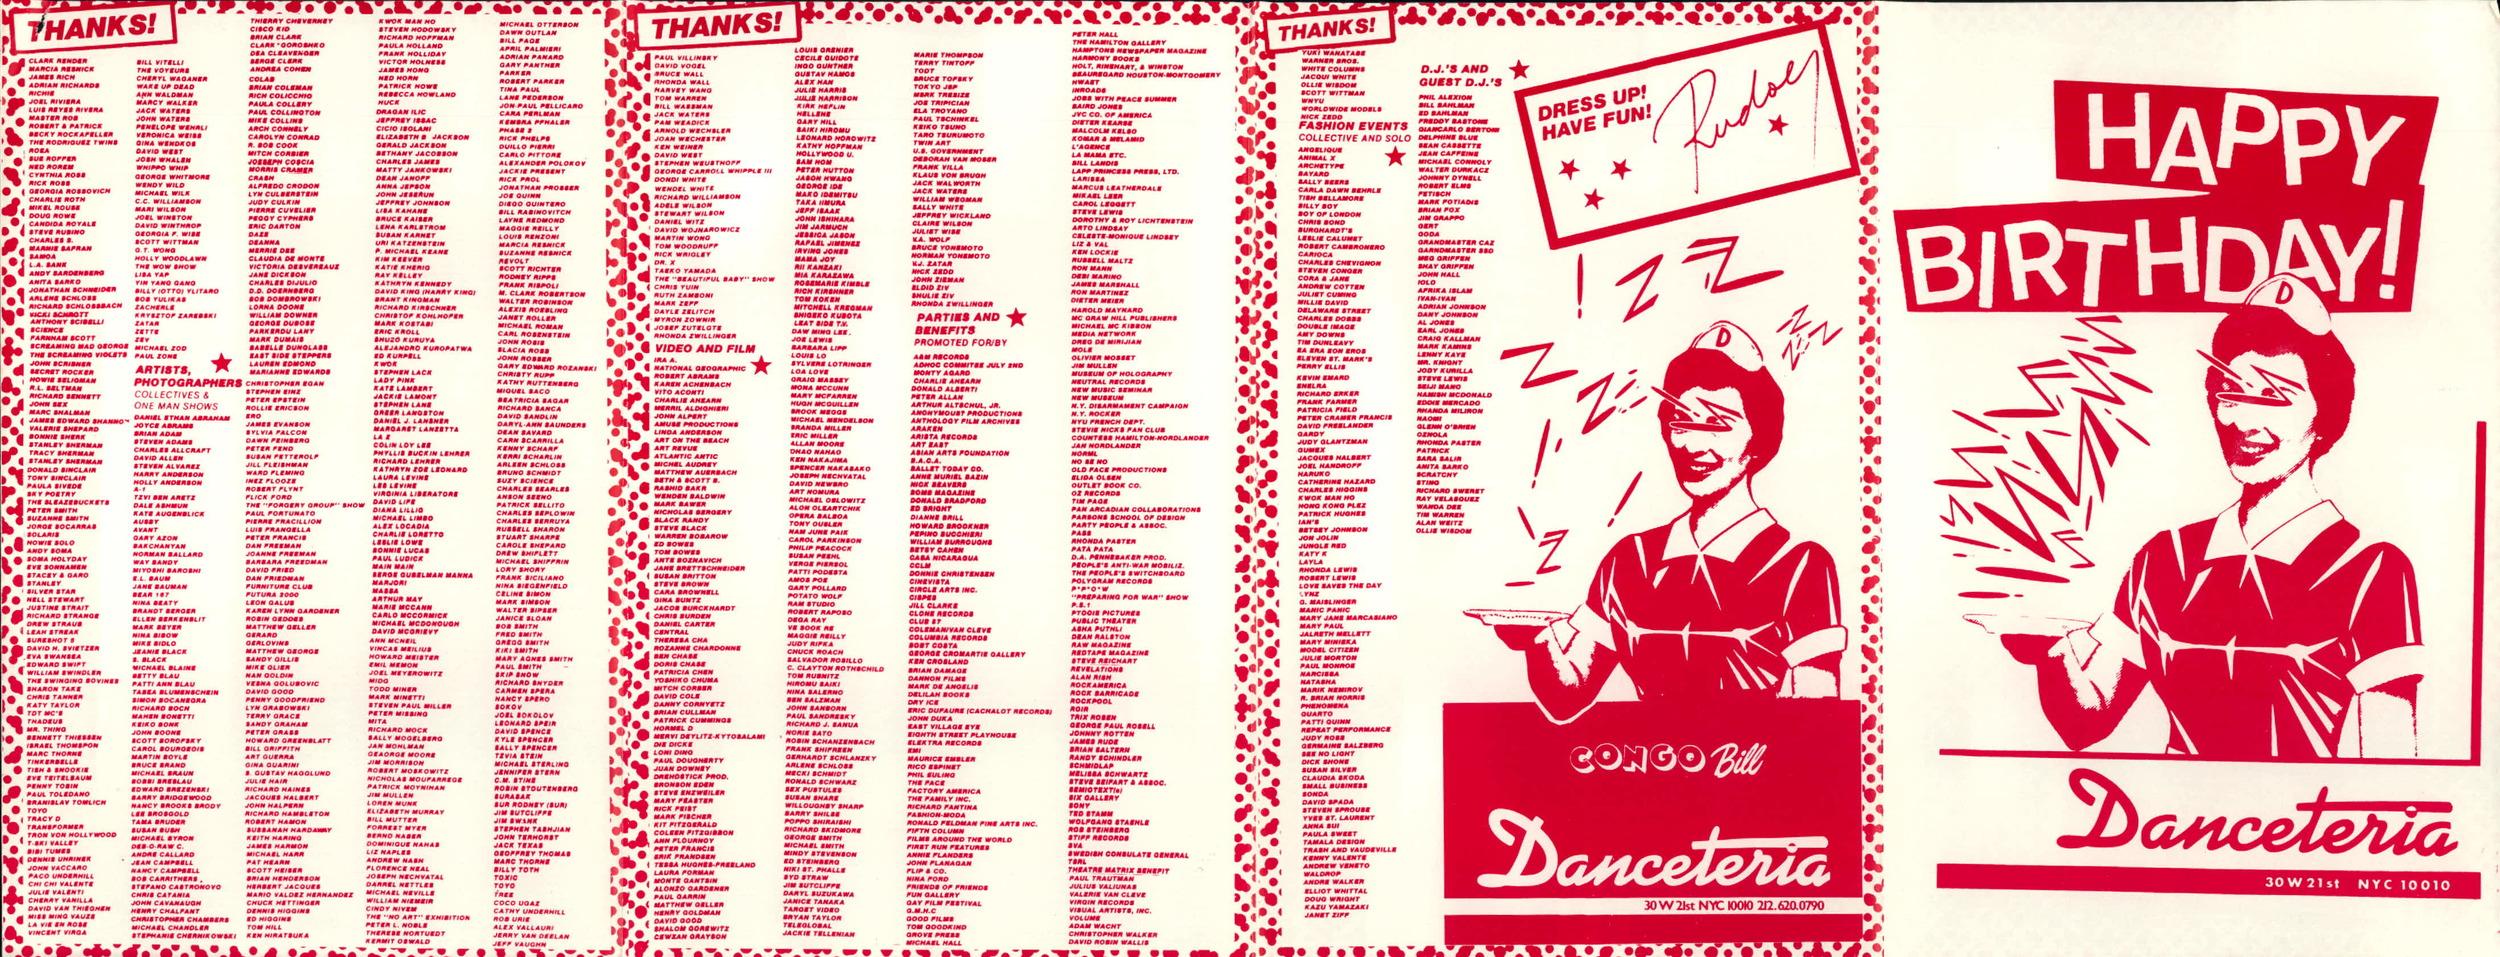 Danceteria publicity. Courtesy of John Argento.